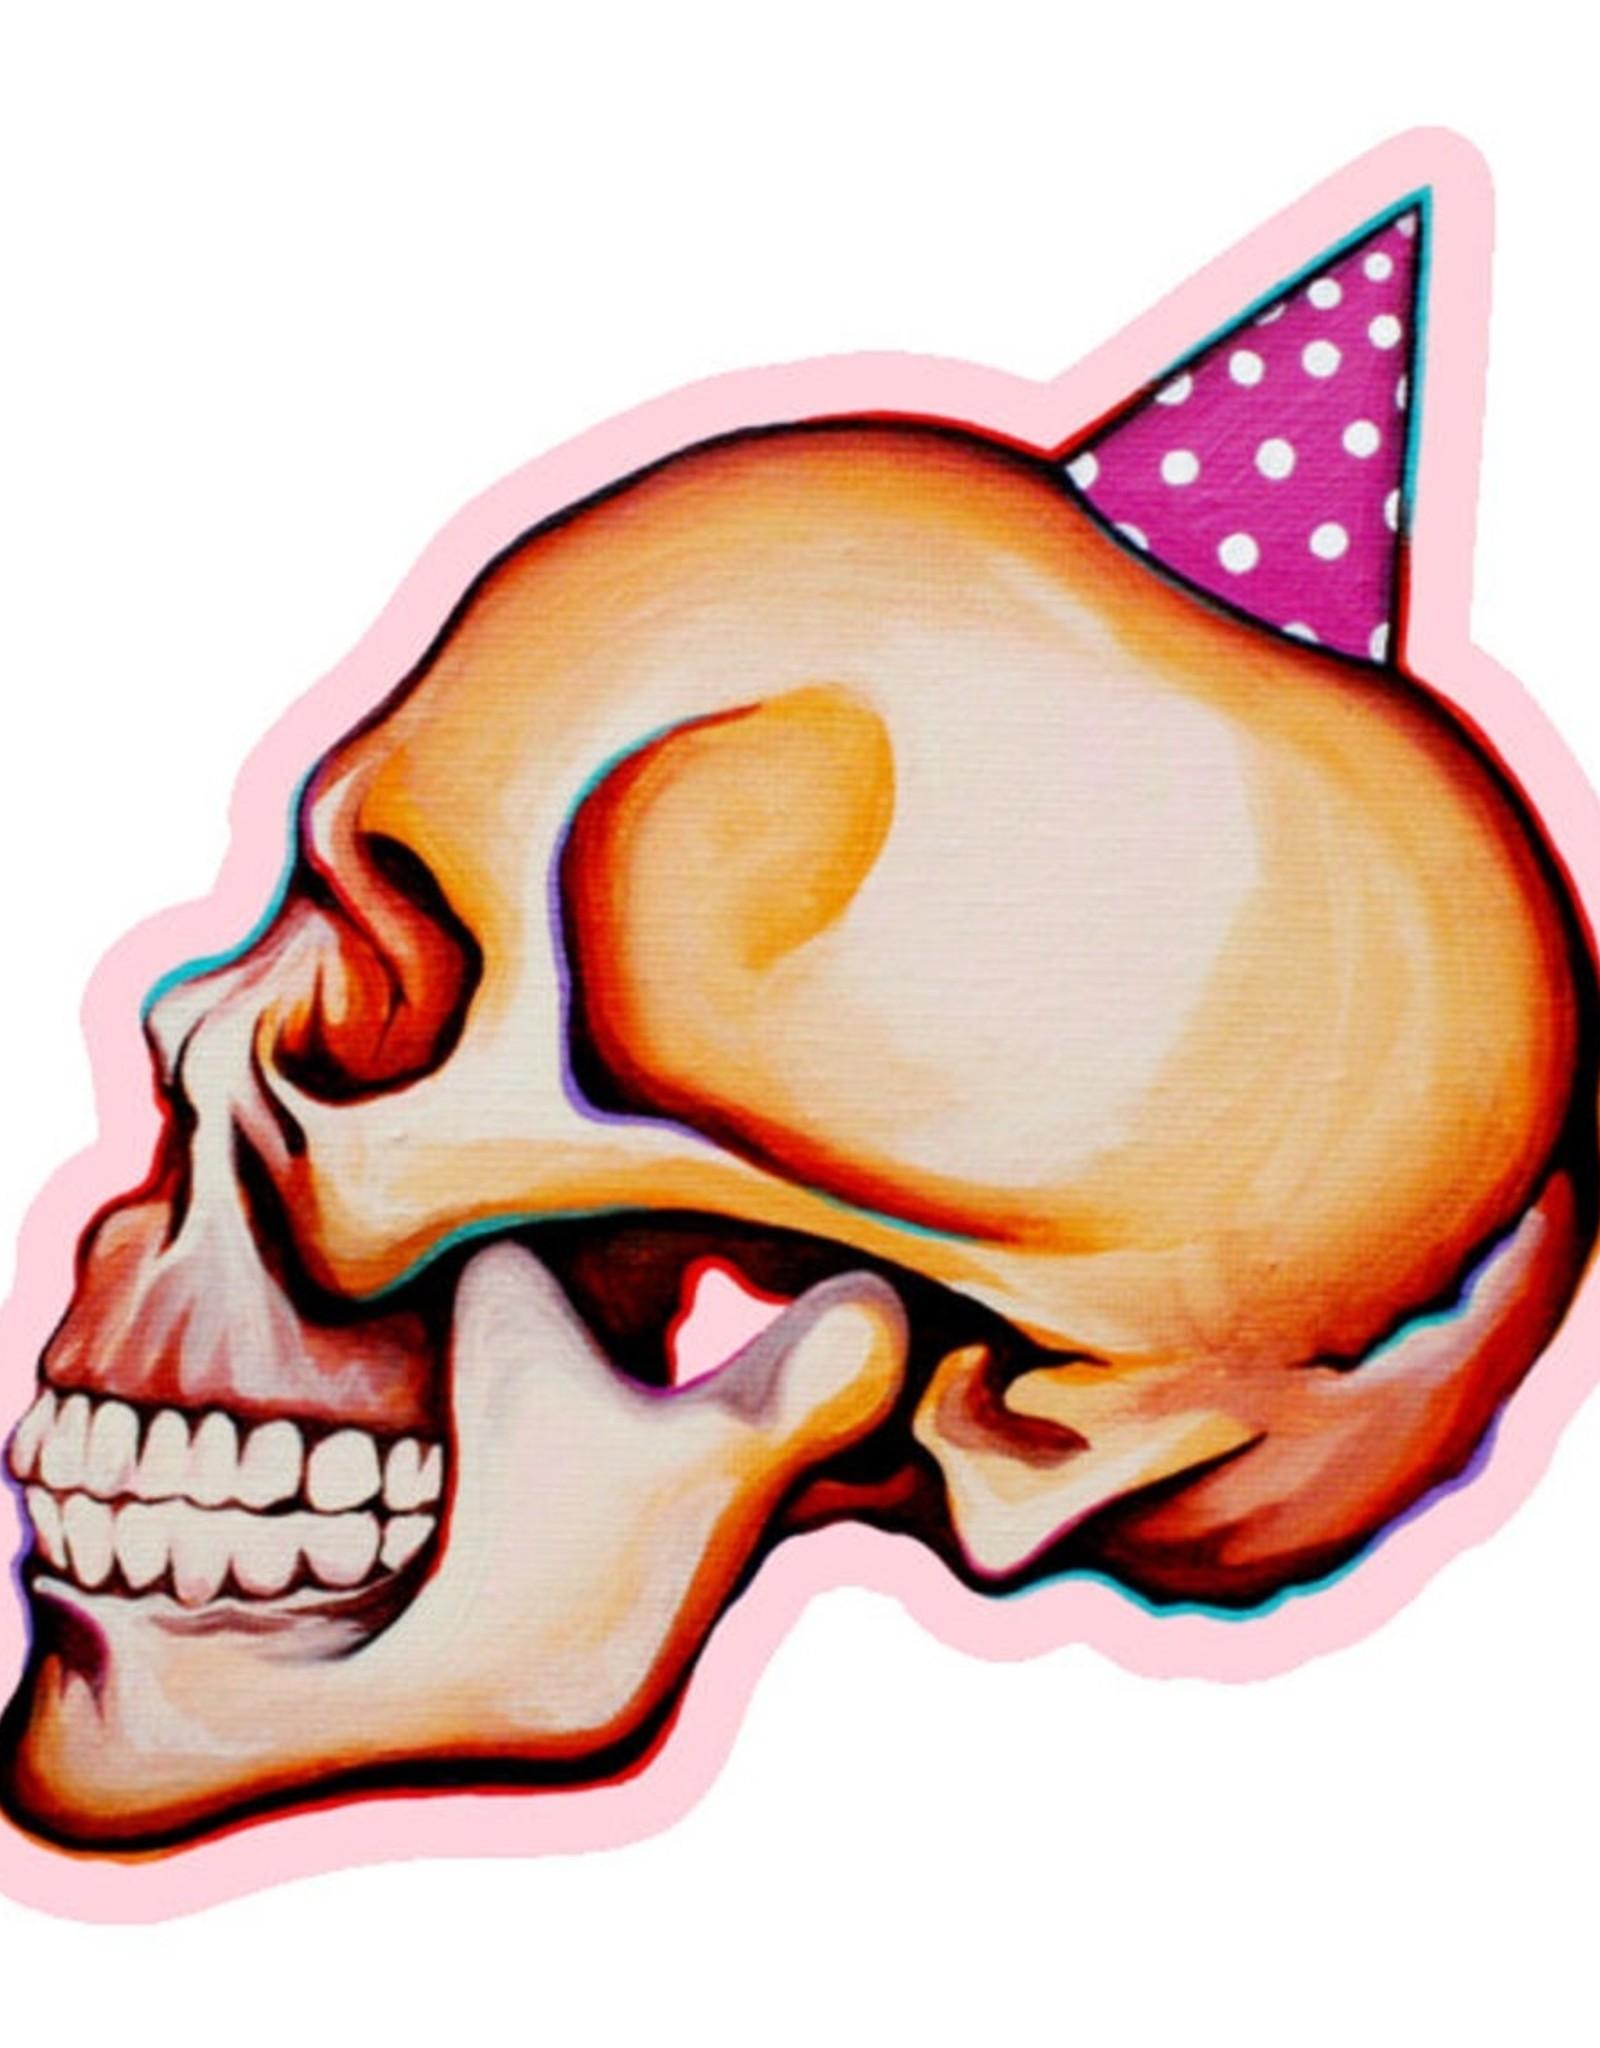 Kaitlin Ziesmer Party Skull Magnet by Kaitlin Ziesmer